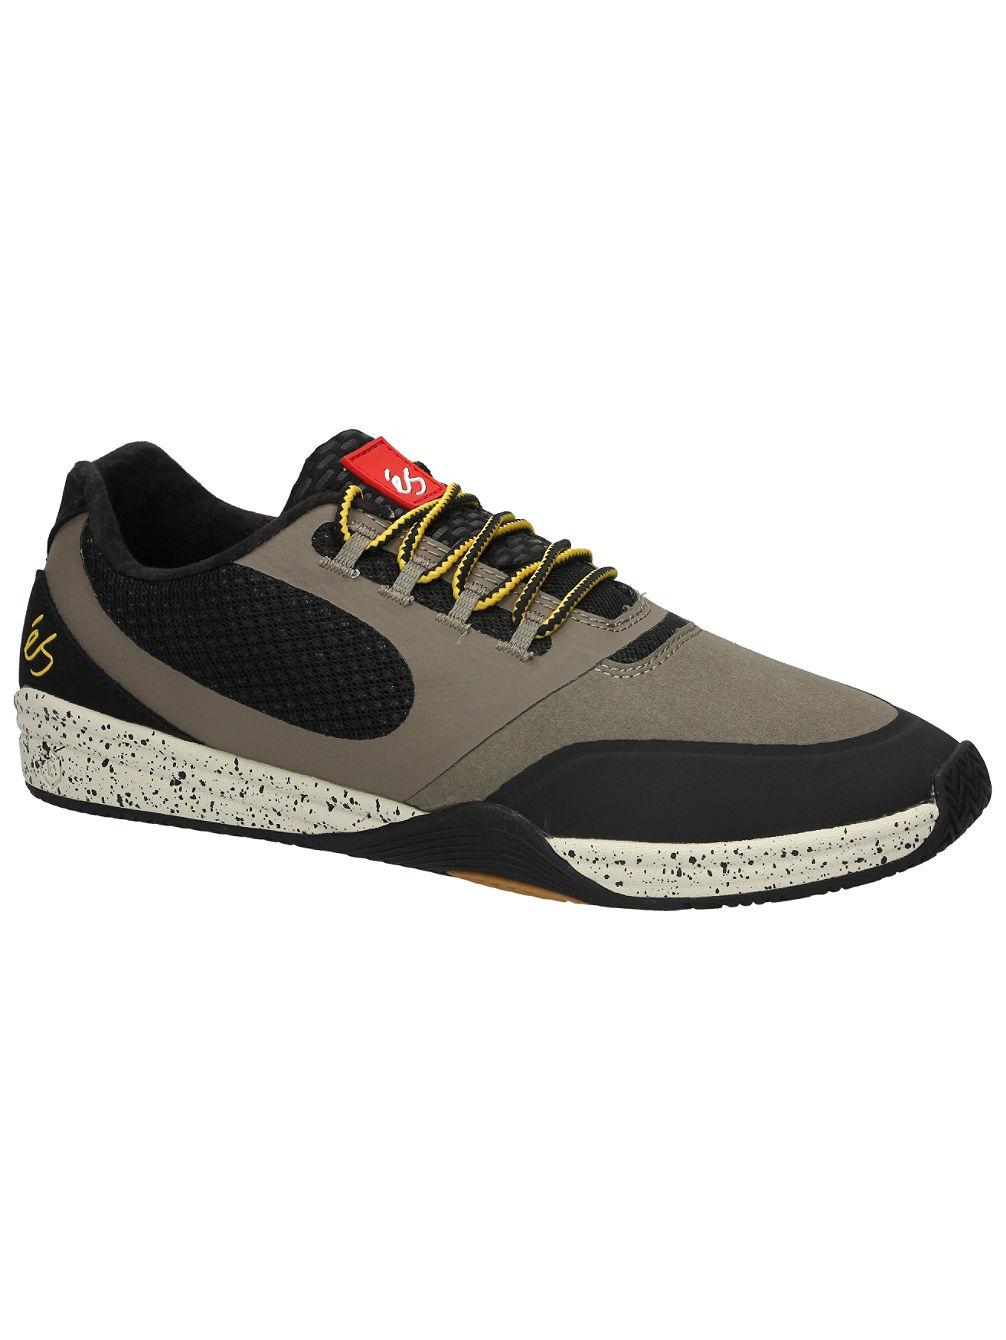 sesla-skate-shoes